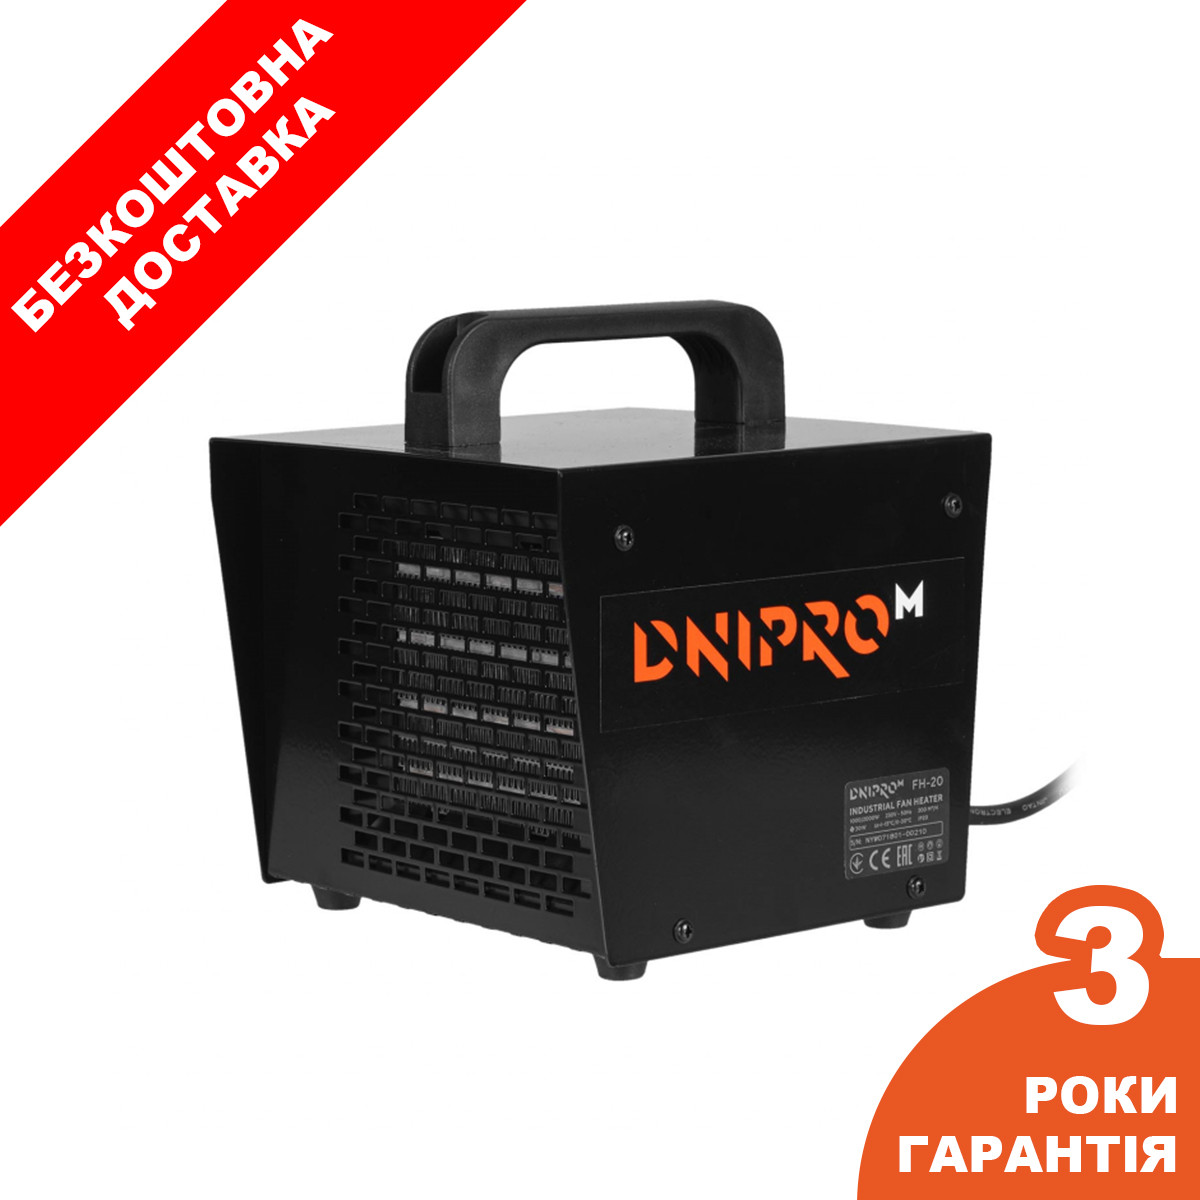 Теплова гармата Dnipro-M FH-20